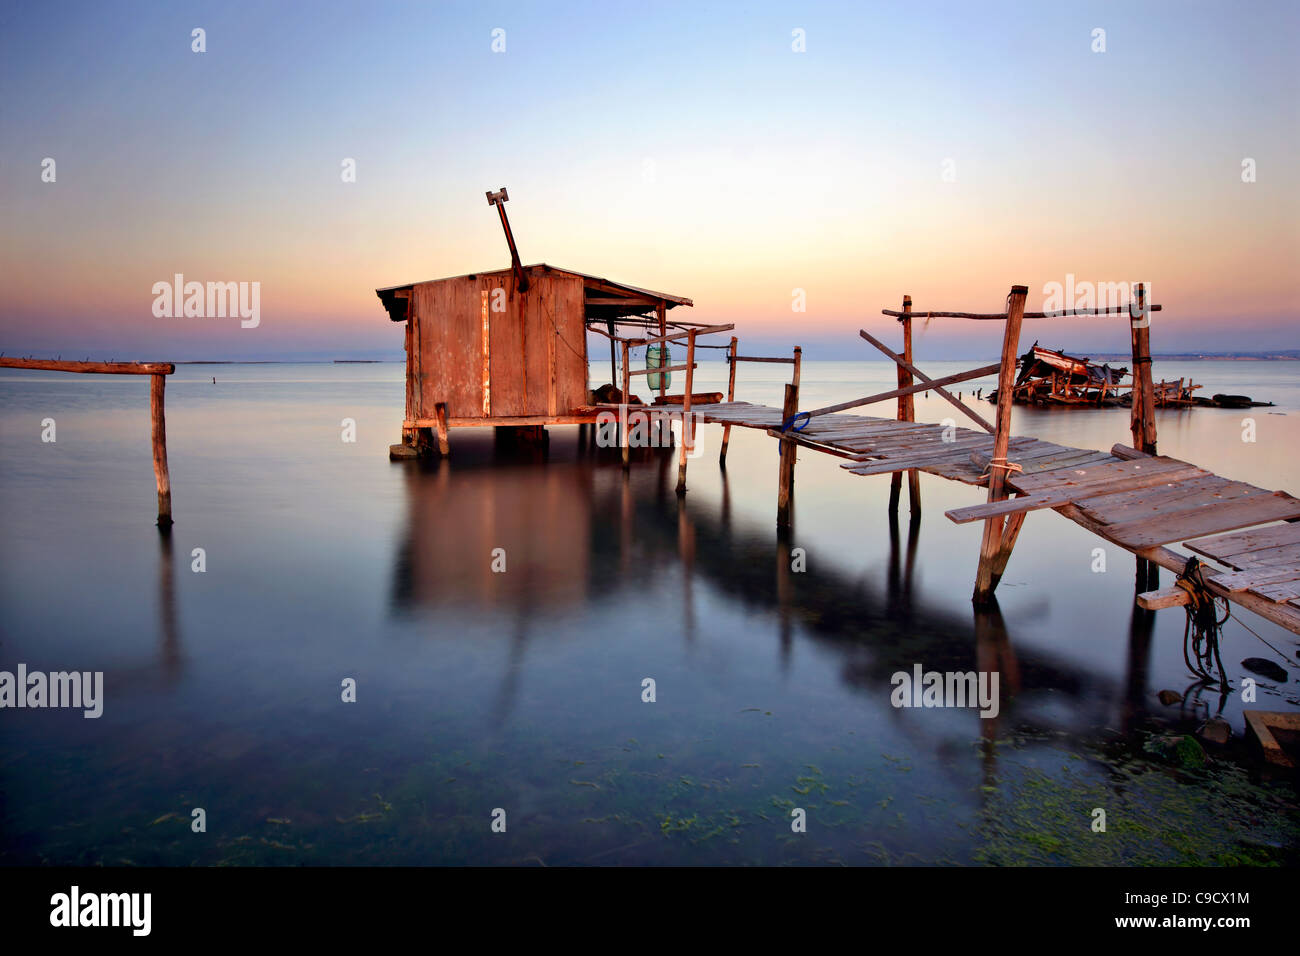 "Stelzen-Hütte im Delta des Axios (auch bekannt als ""Vardaris"") Fluss, Thessaloniki, Makedonien, Griechenland Stockbild"